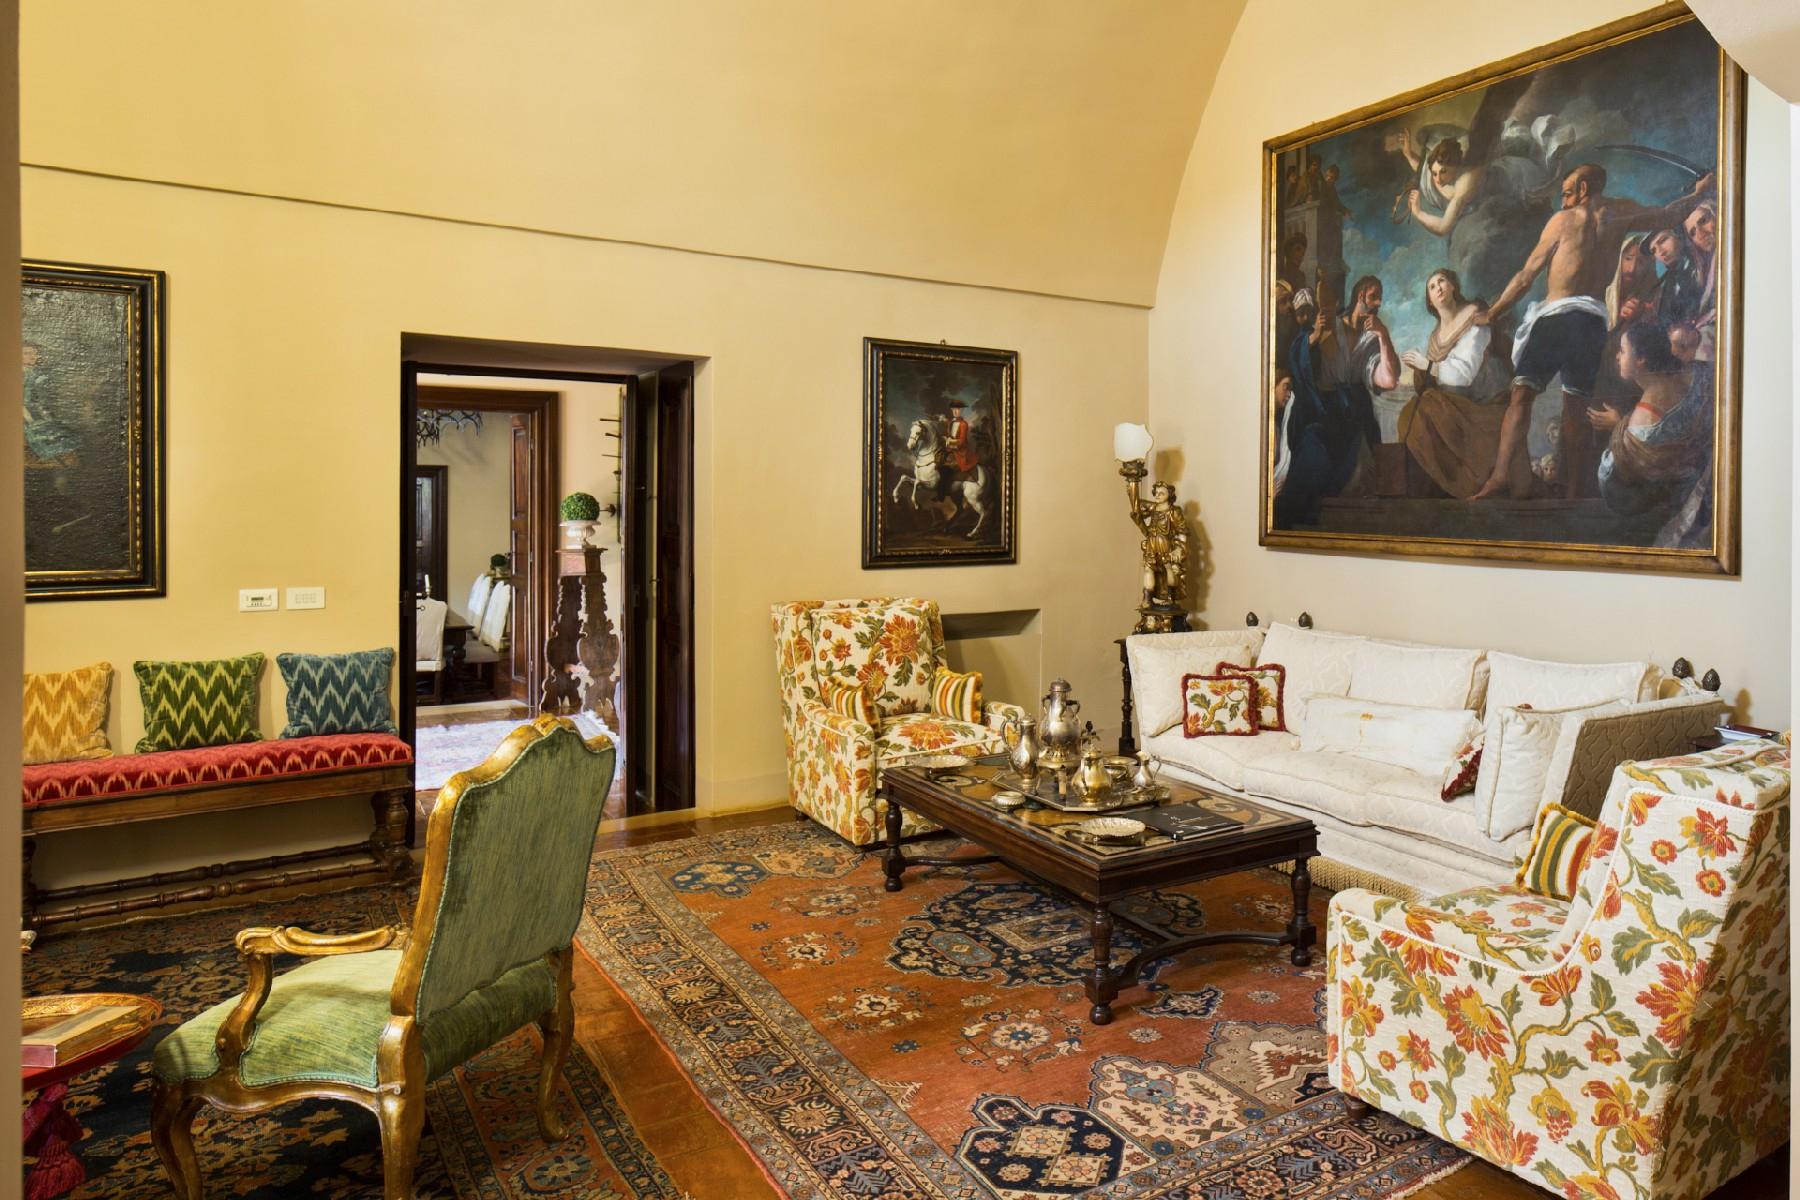 Villa in Vendita a Tricase: 5 locali, 1700 mq - Foto 7